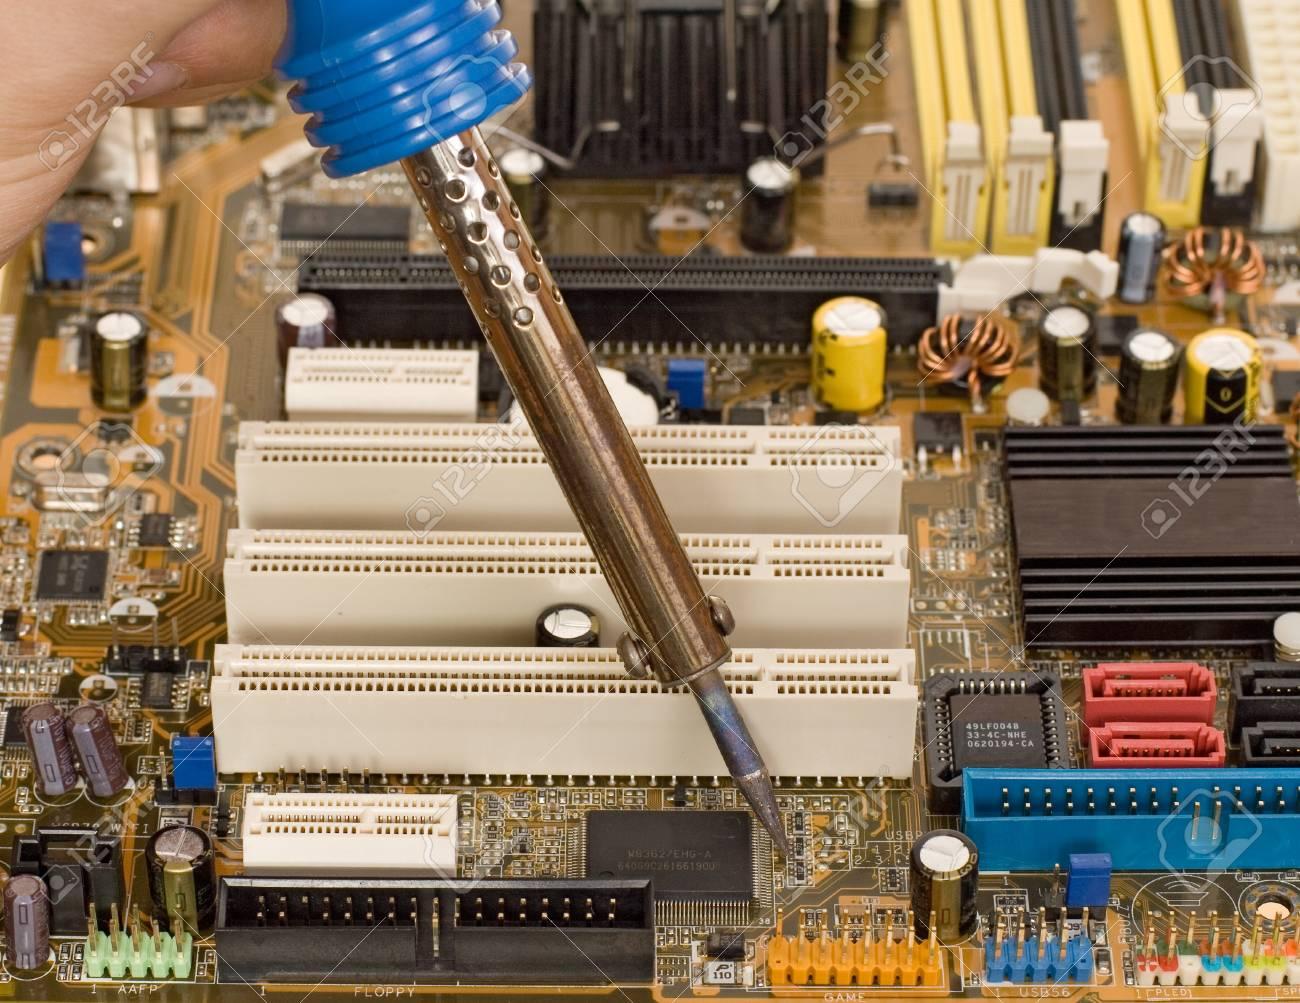 Printed Circuit Board Repair Work Stock Photo Picture And Royalty Repairing Computer Free Image 12190980